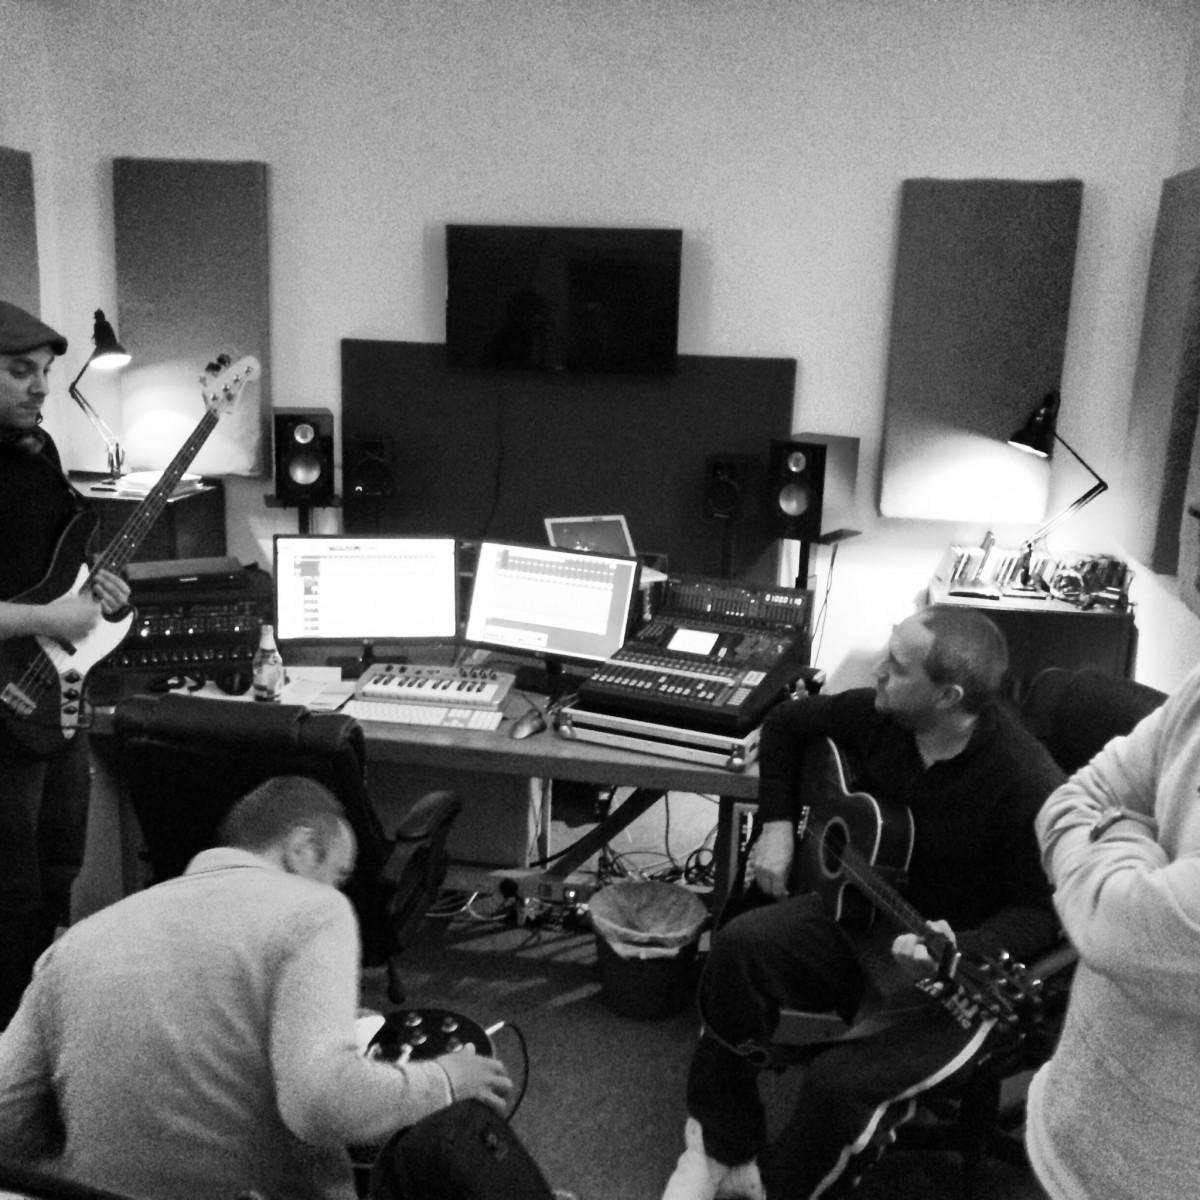 NJA.me.uk - Niall Acott's Recording Studio in the Maidstone area